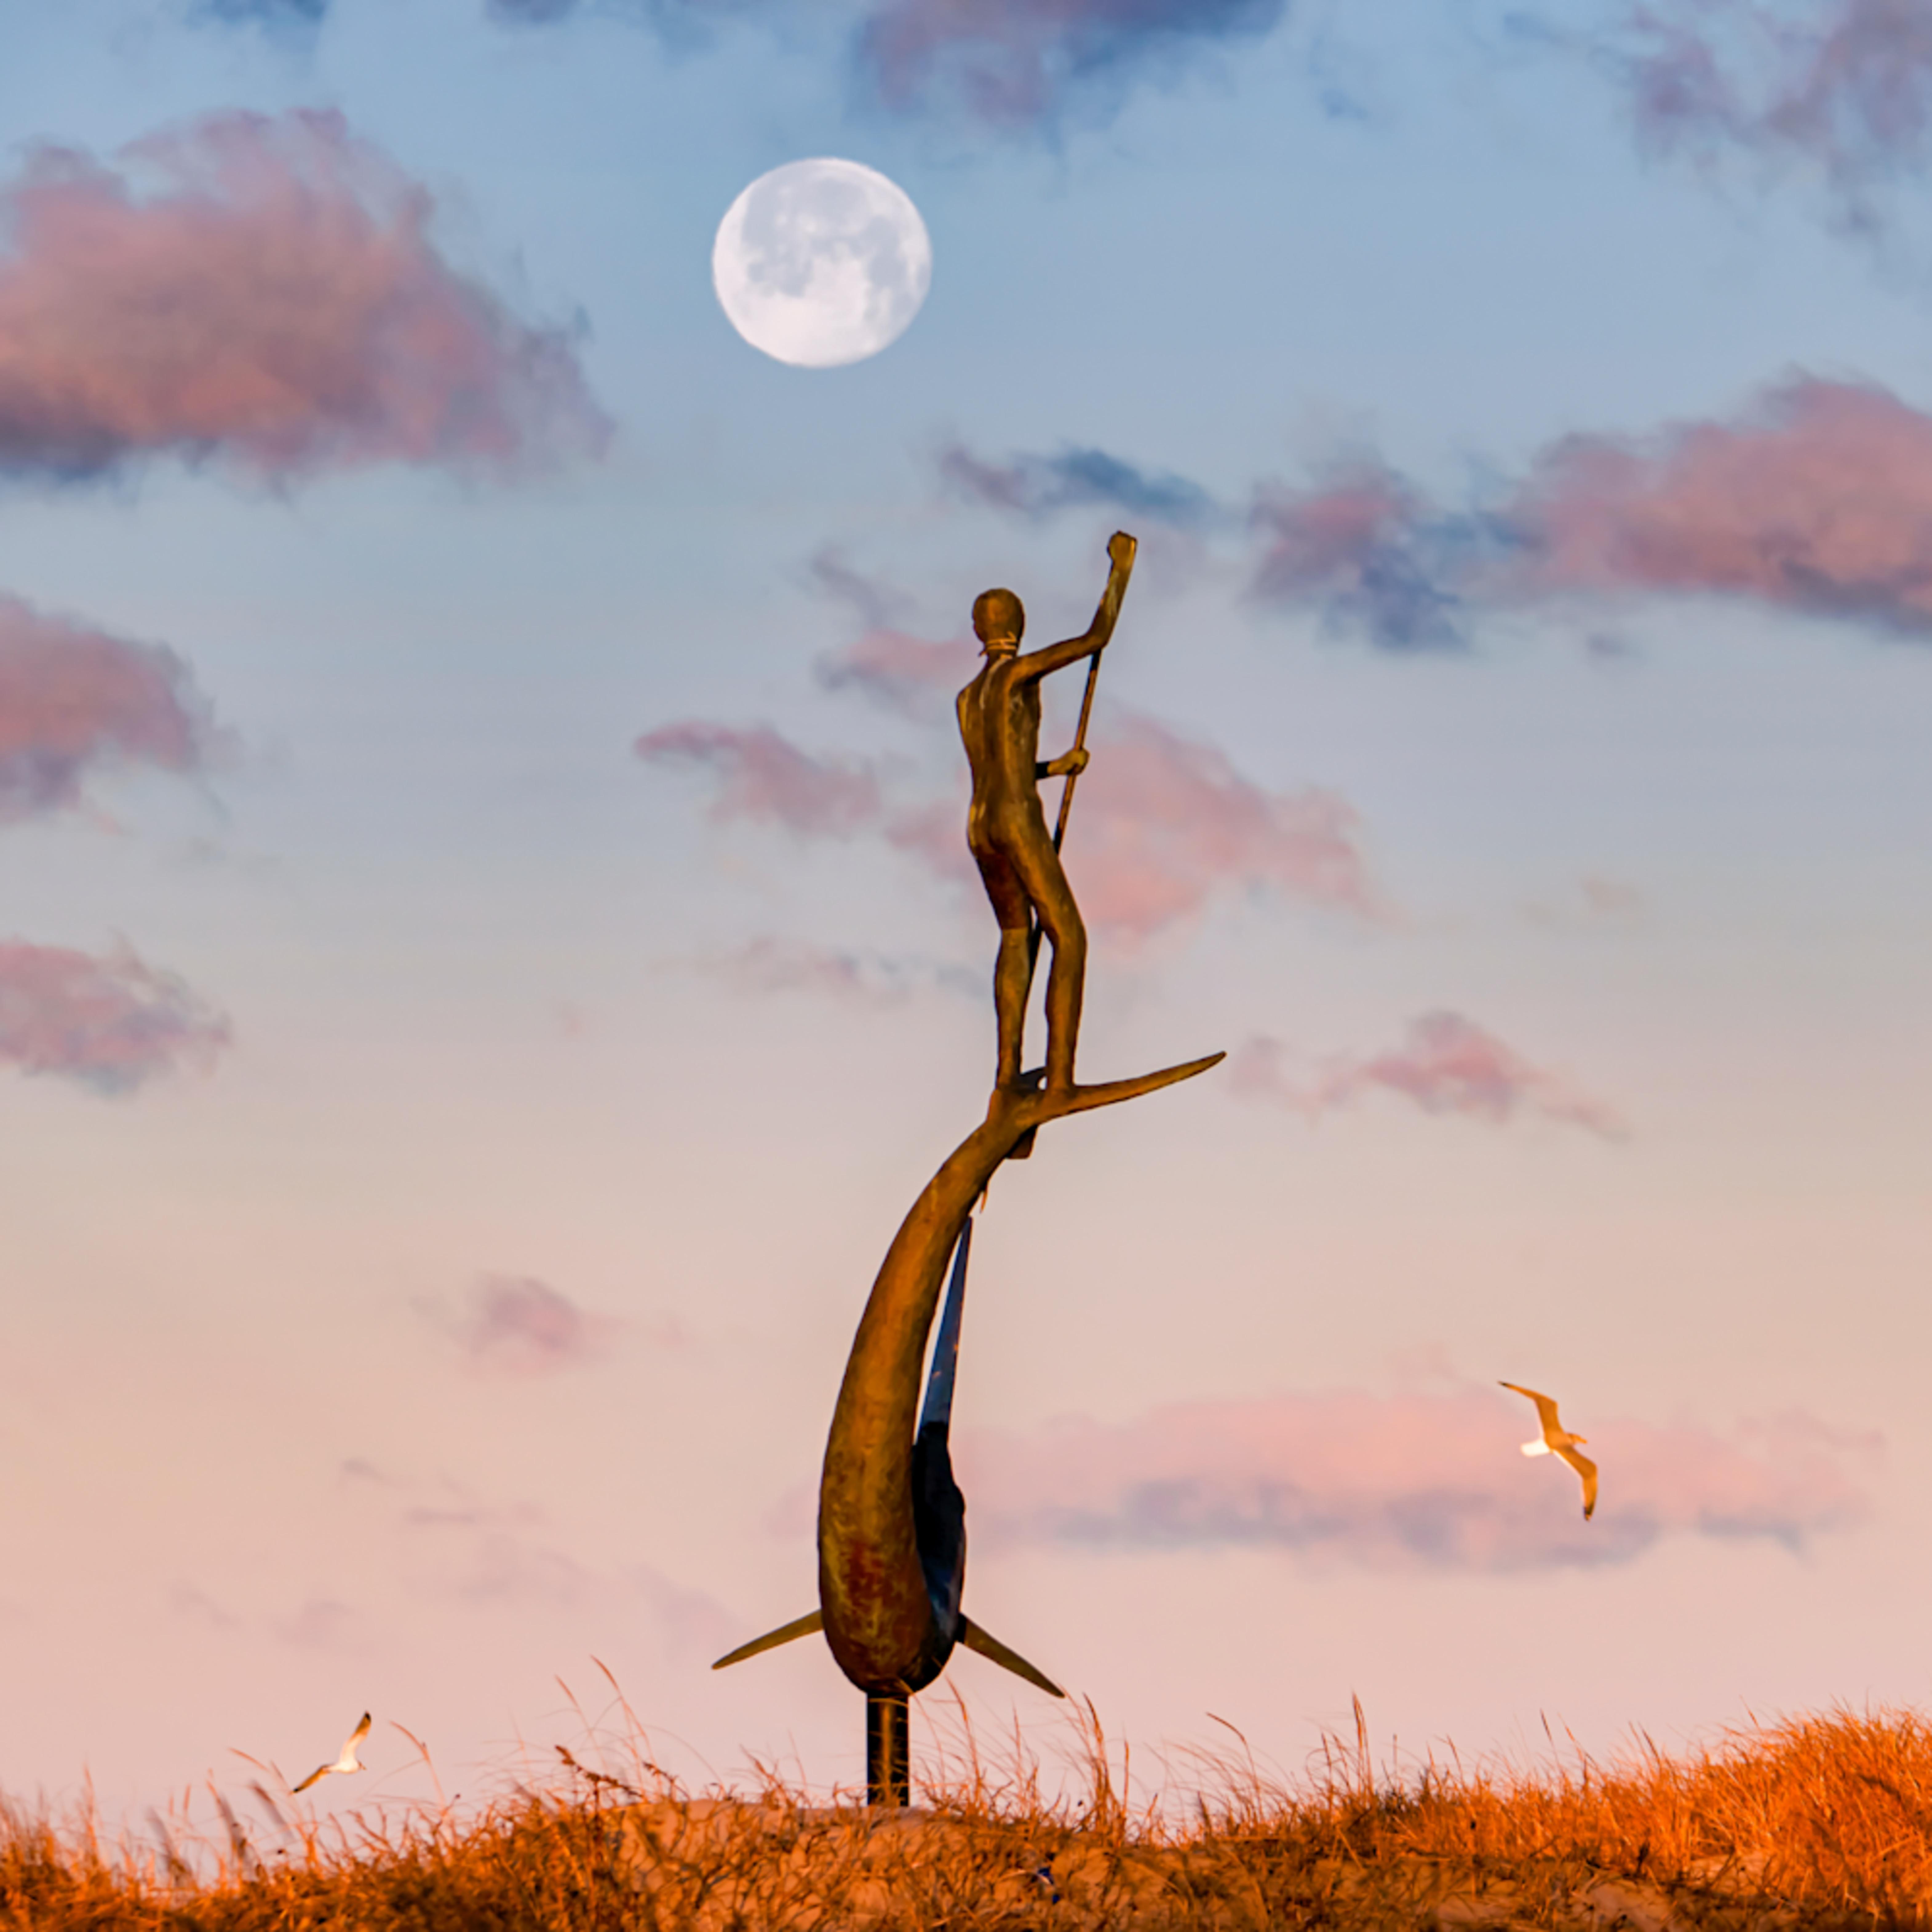 Menemsha sword fisherman moon gxhhbl